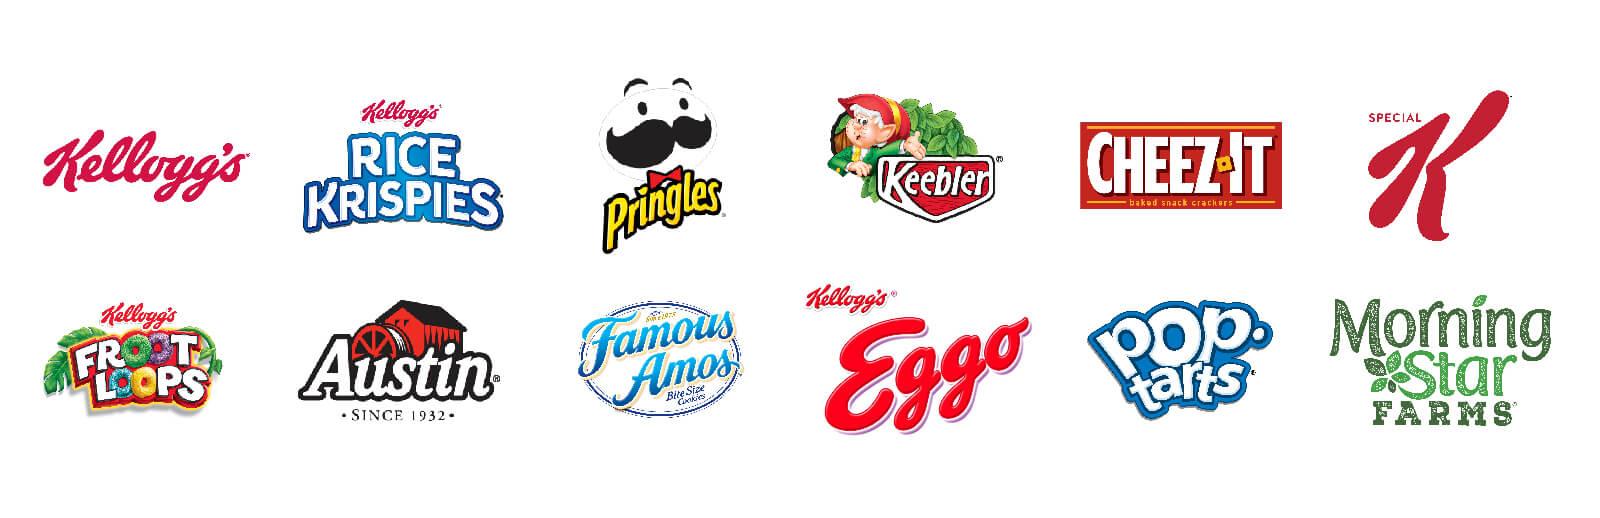 Kelloggs Brand Architecture and Logos